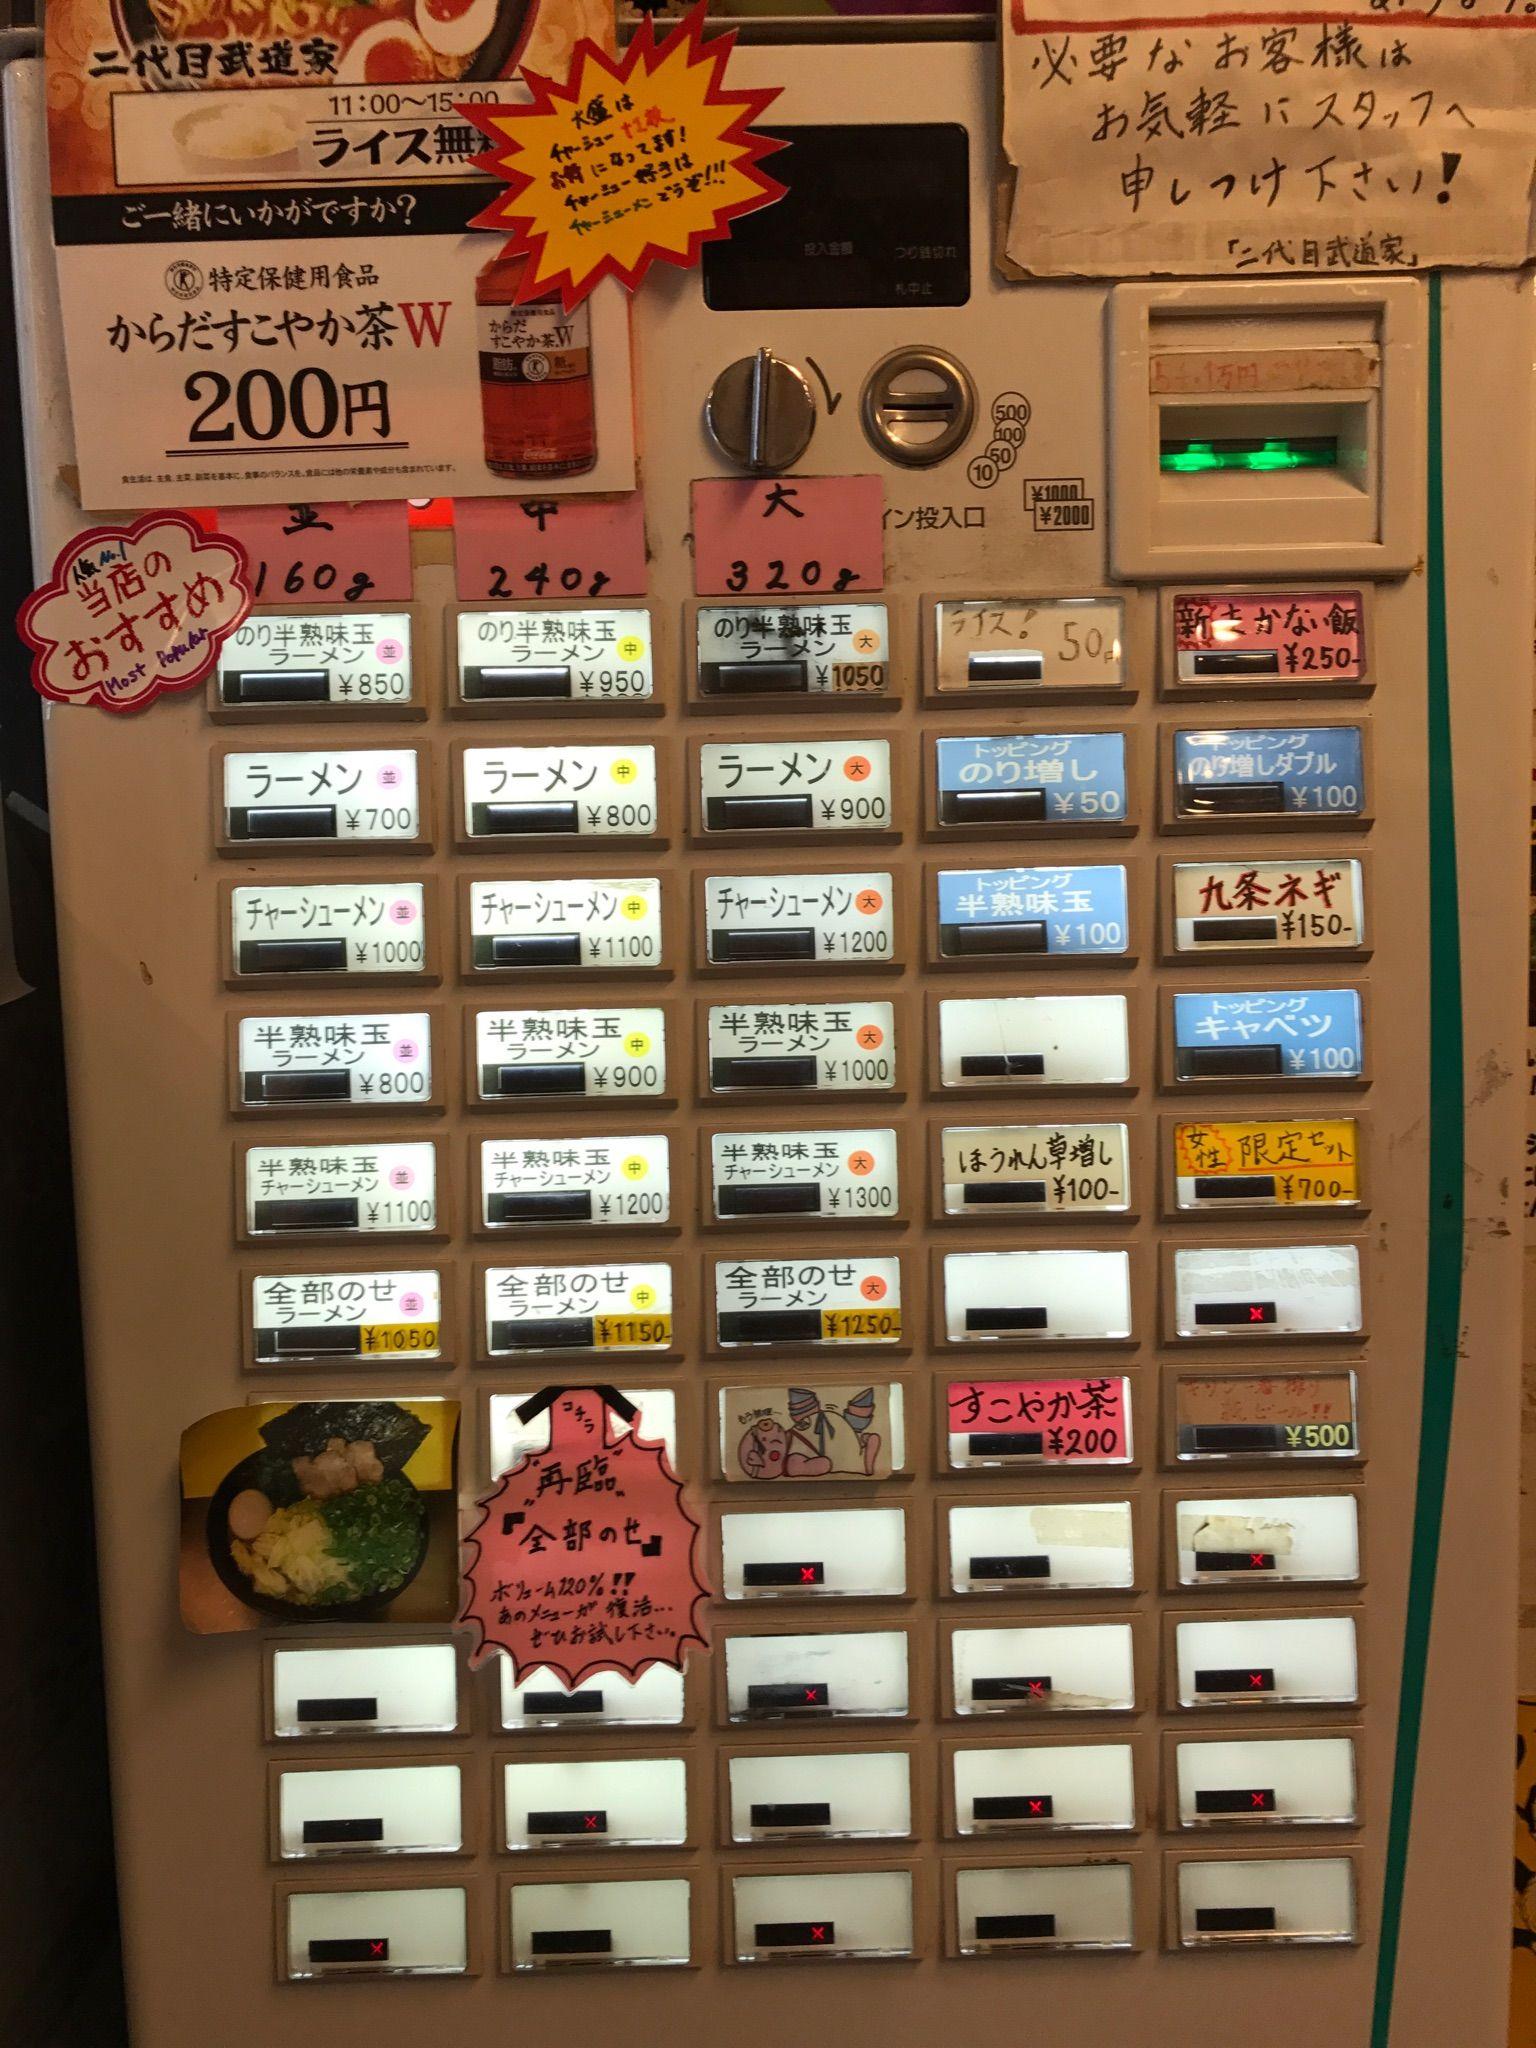 How To Use Ramen Tickethines Ramen Tokyo Japan Food